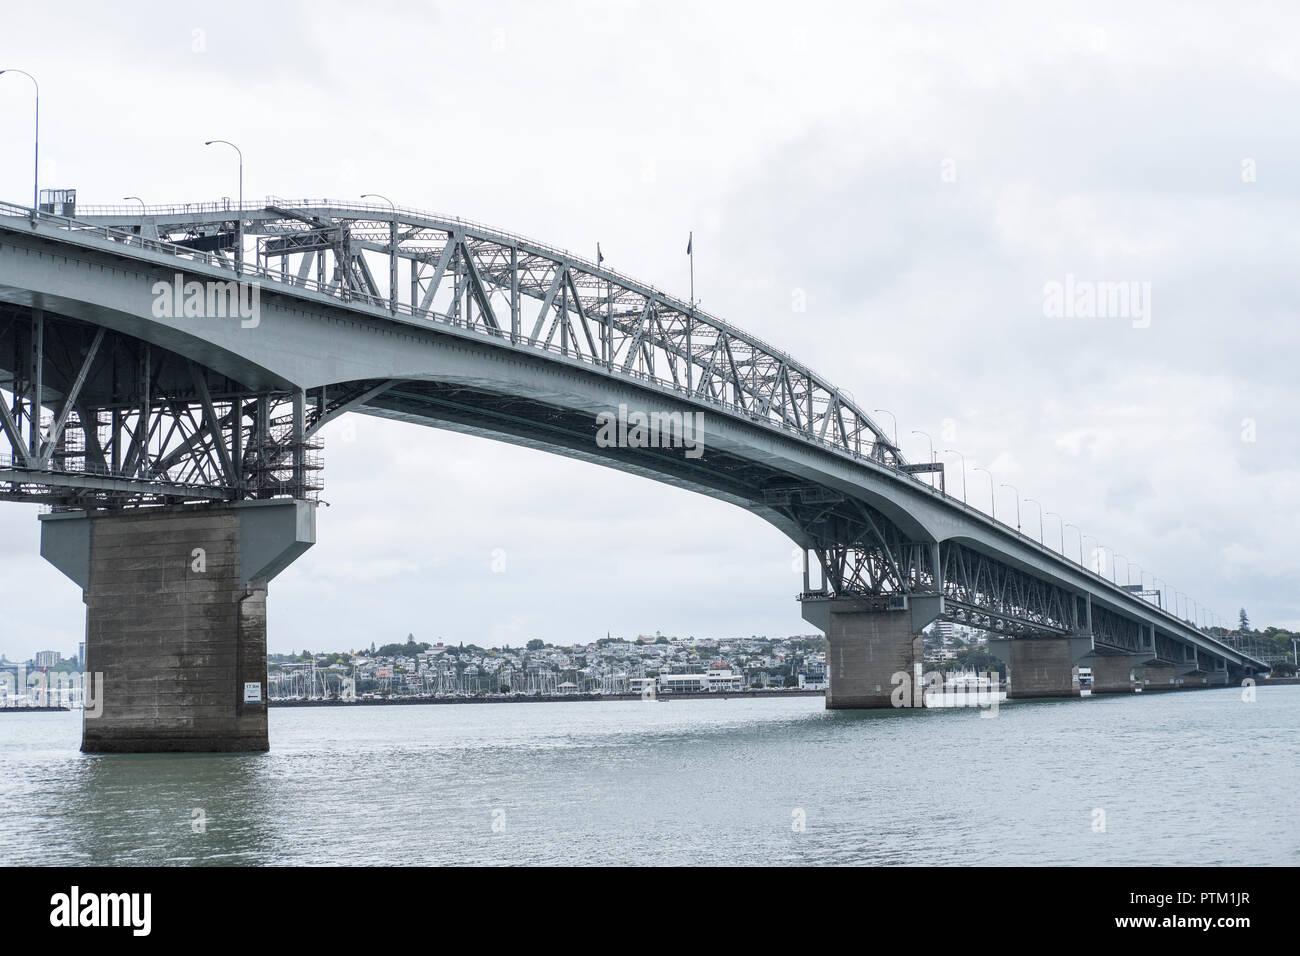 A view towards the Auckland Harbour Bridge. - Stock Image